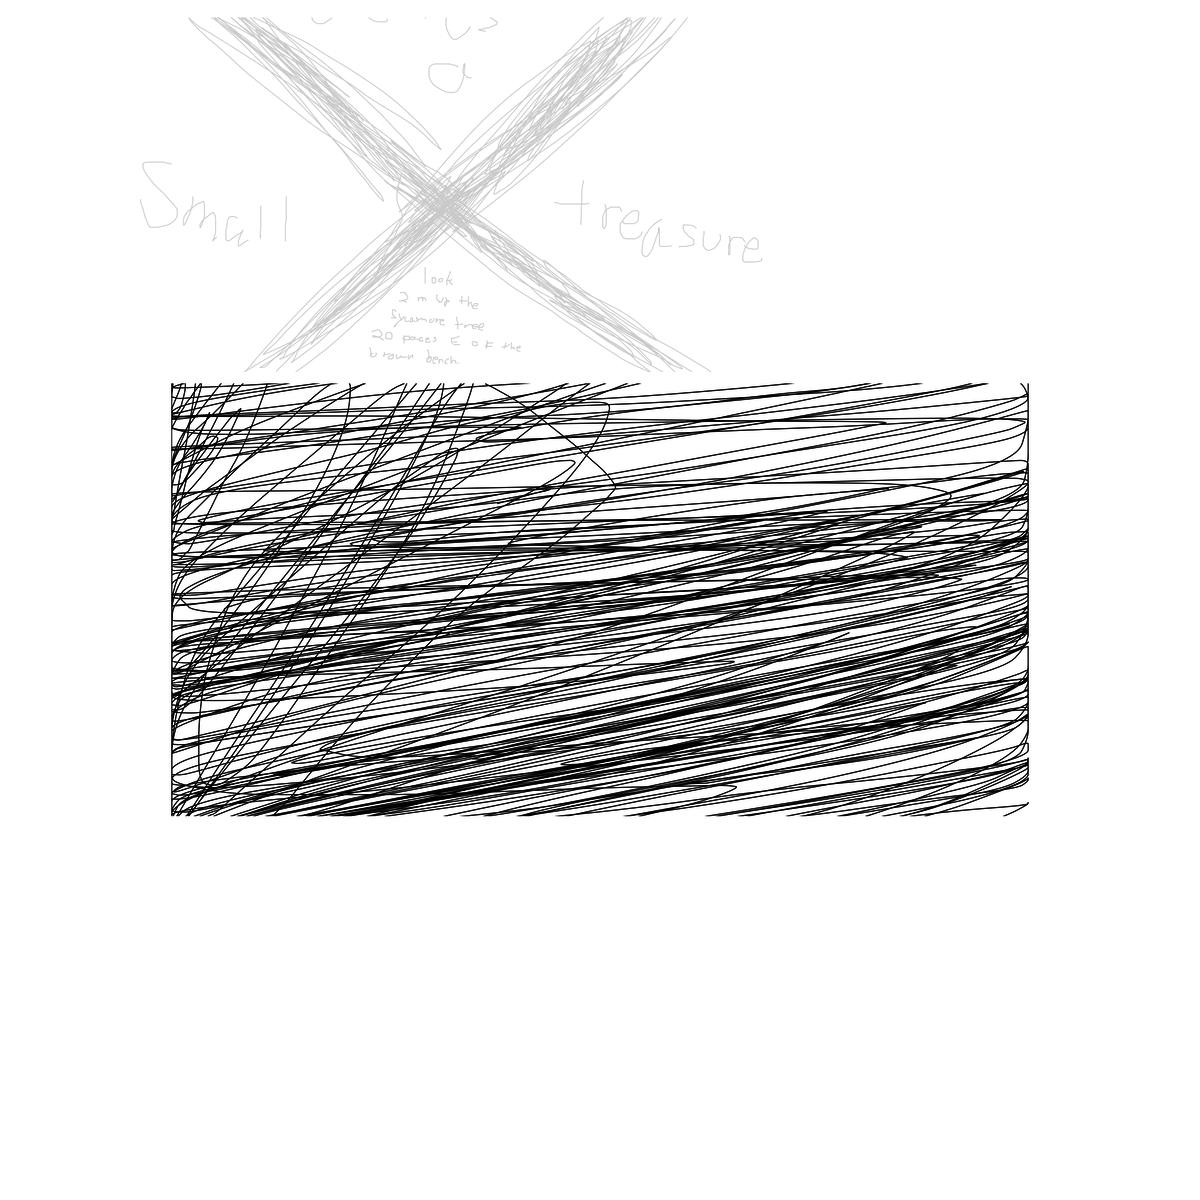 BAAAM drawing#12041 lat:43.6685943603515600lng: -79.3541564941406200